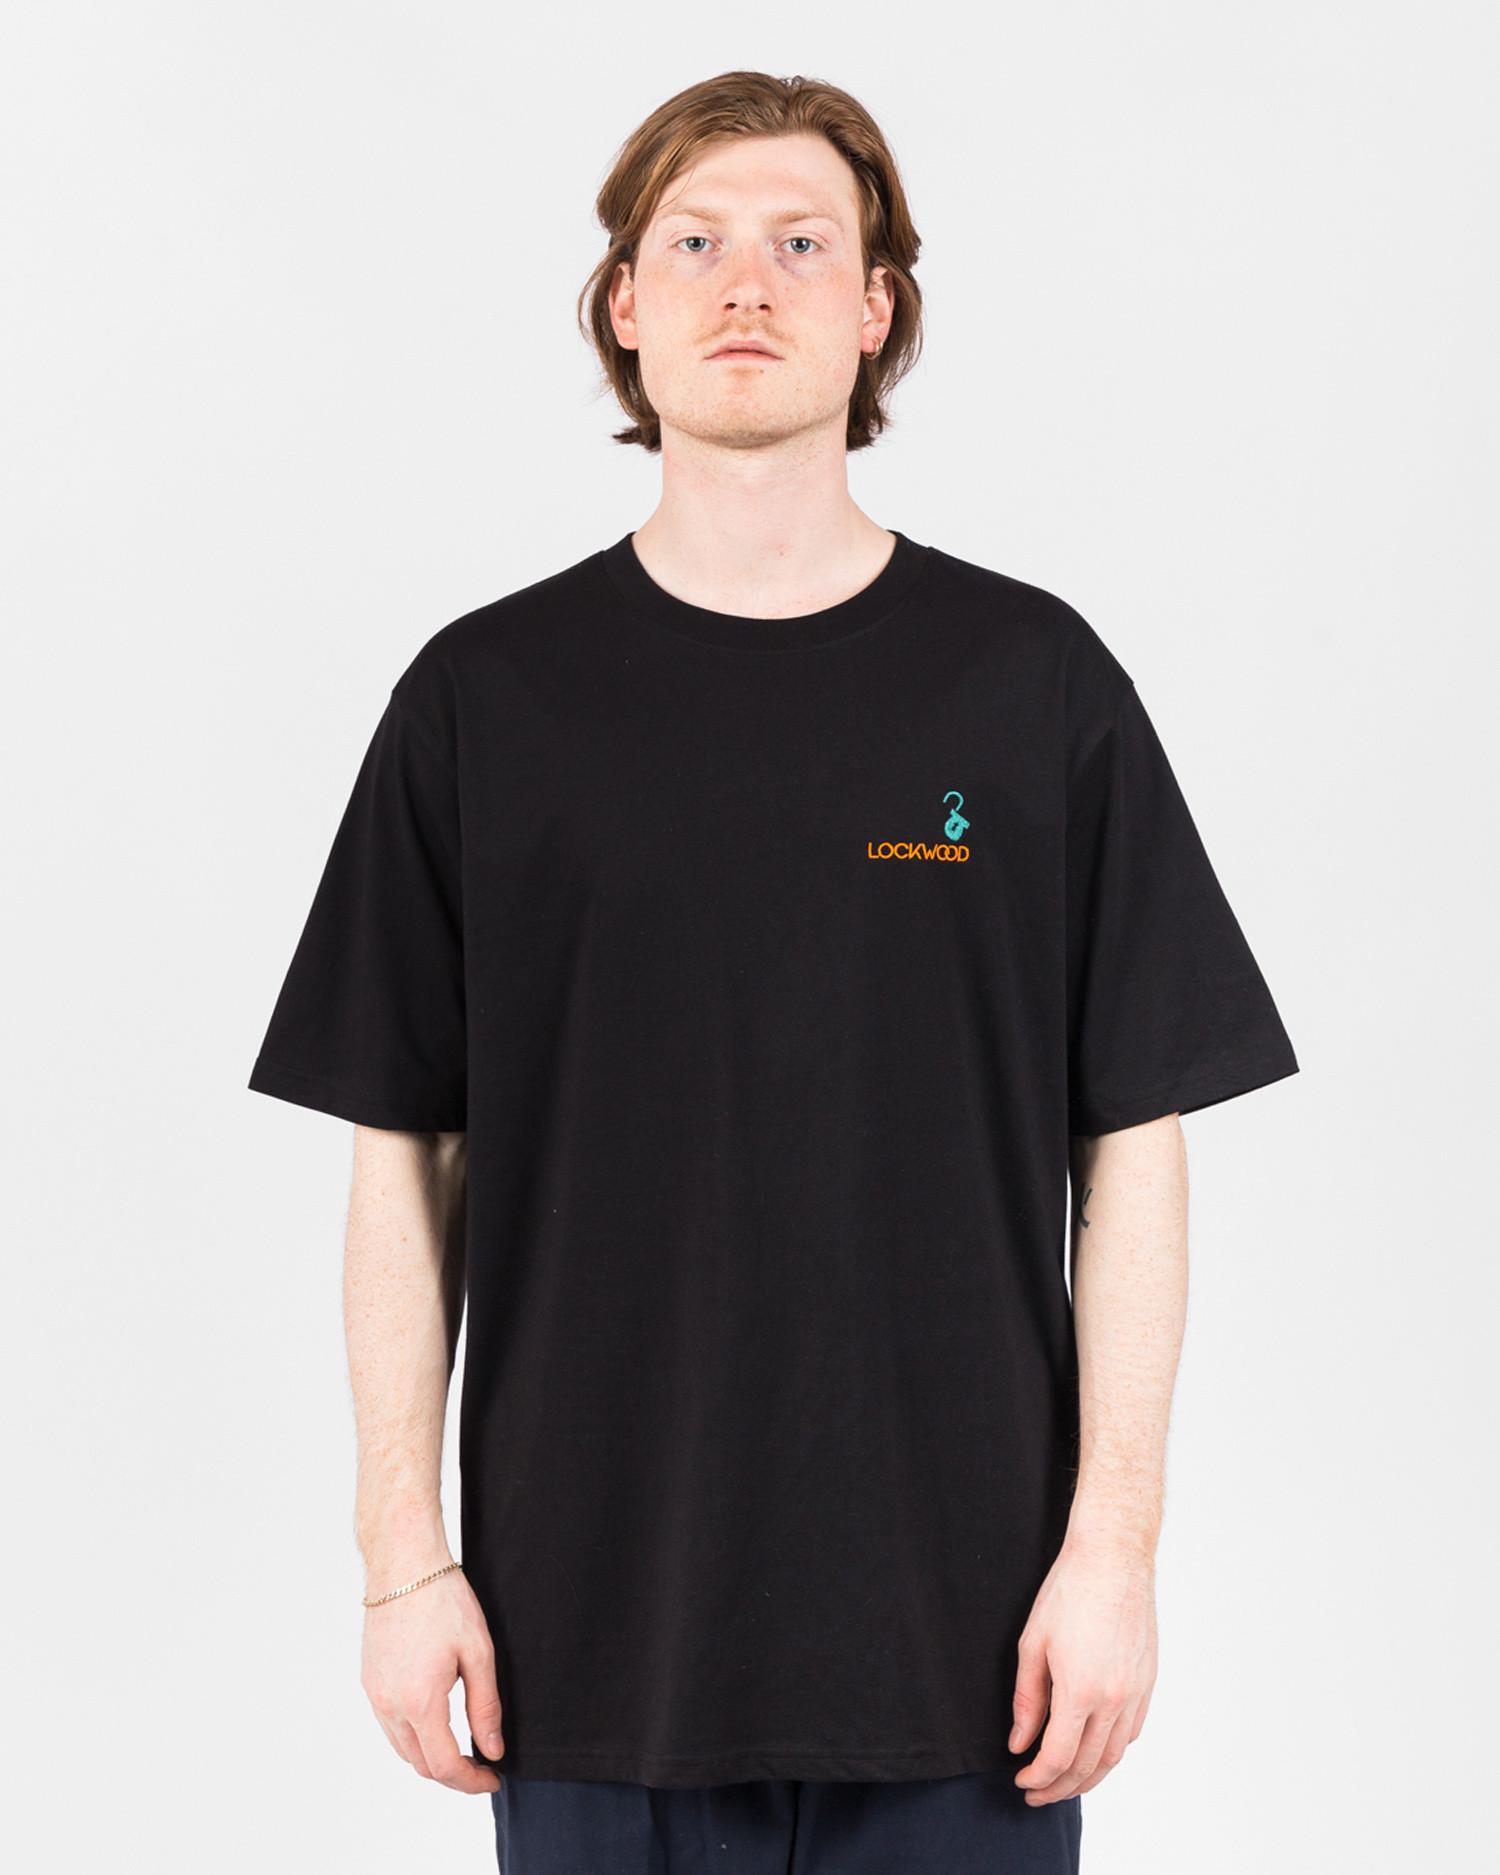 Lockwood Embroidery T-shirt Black